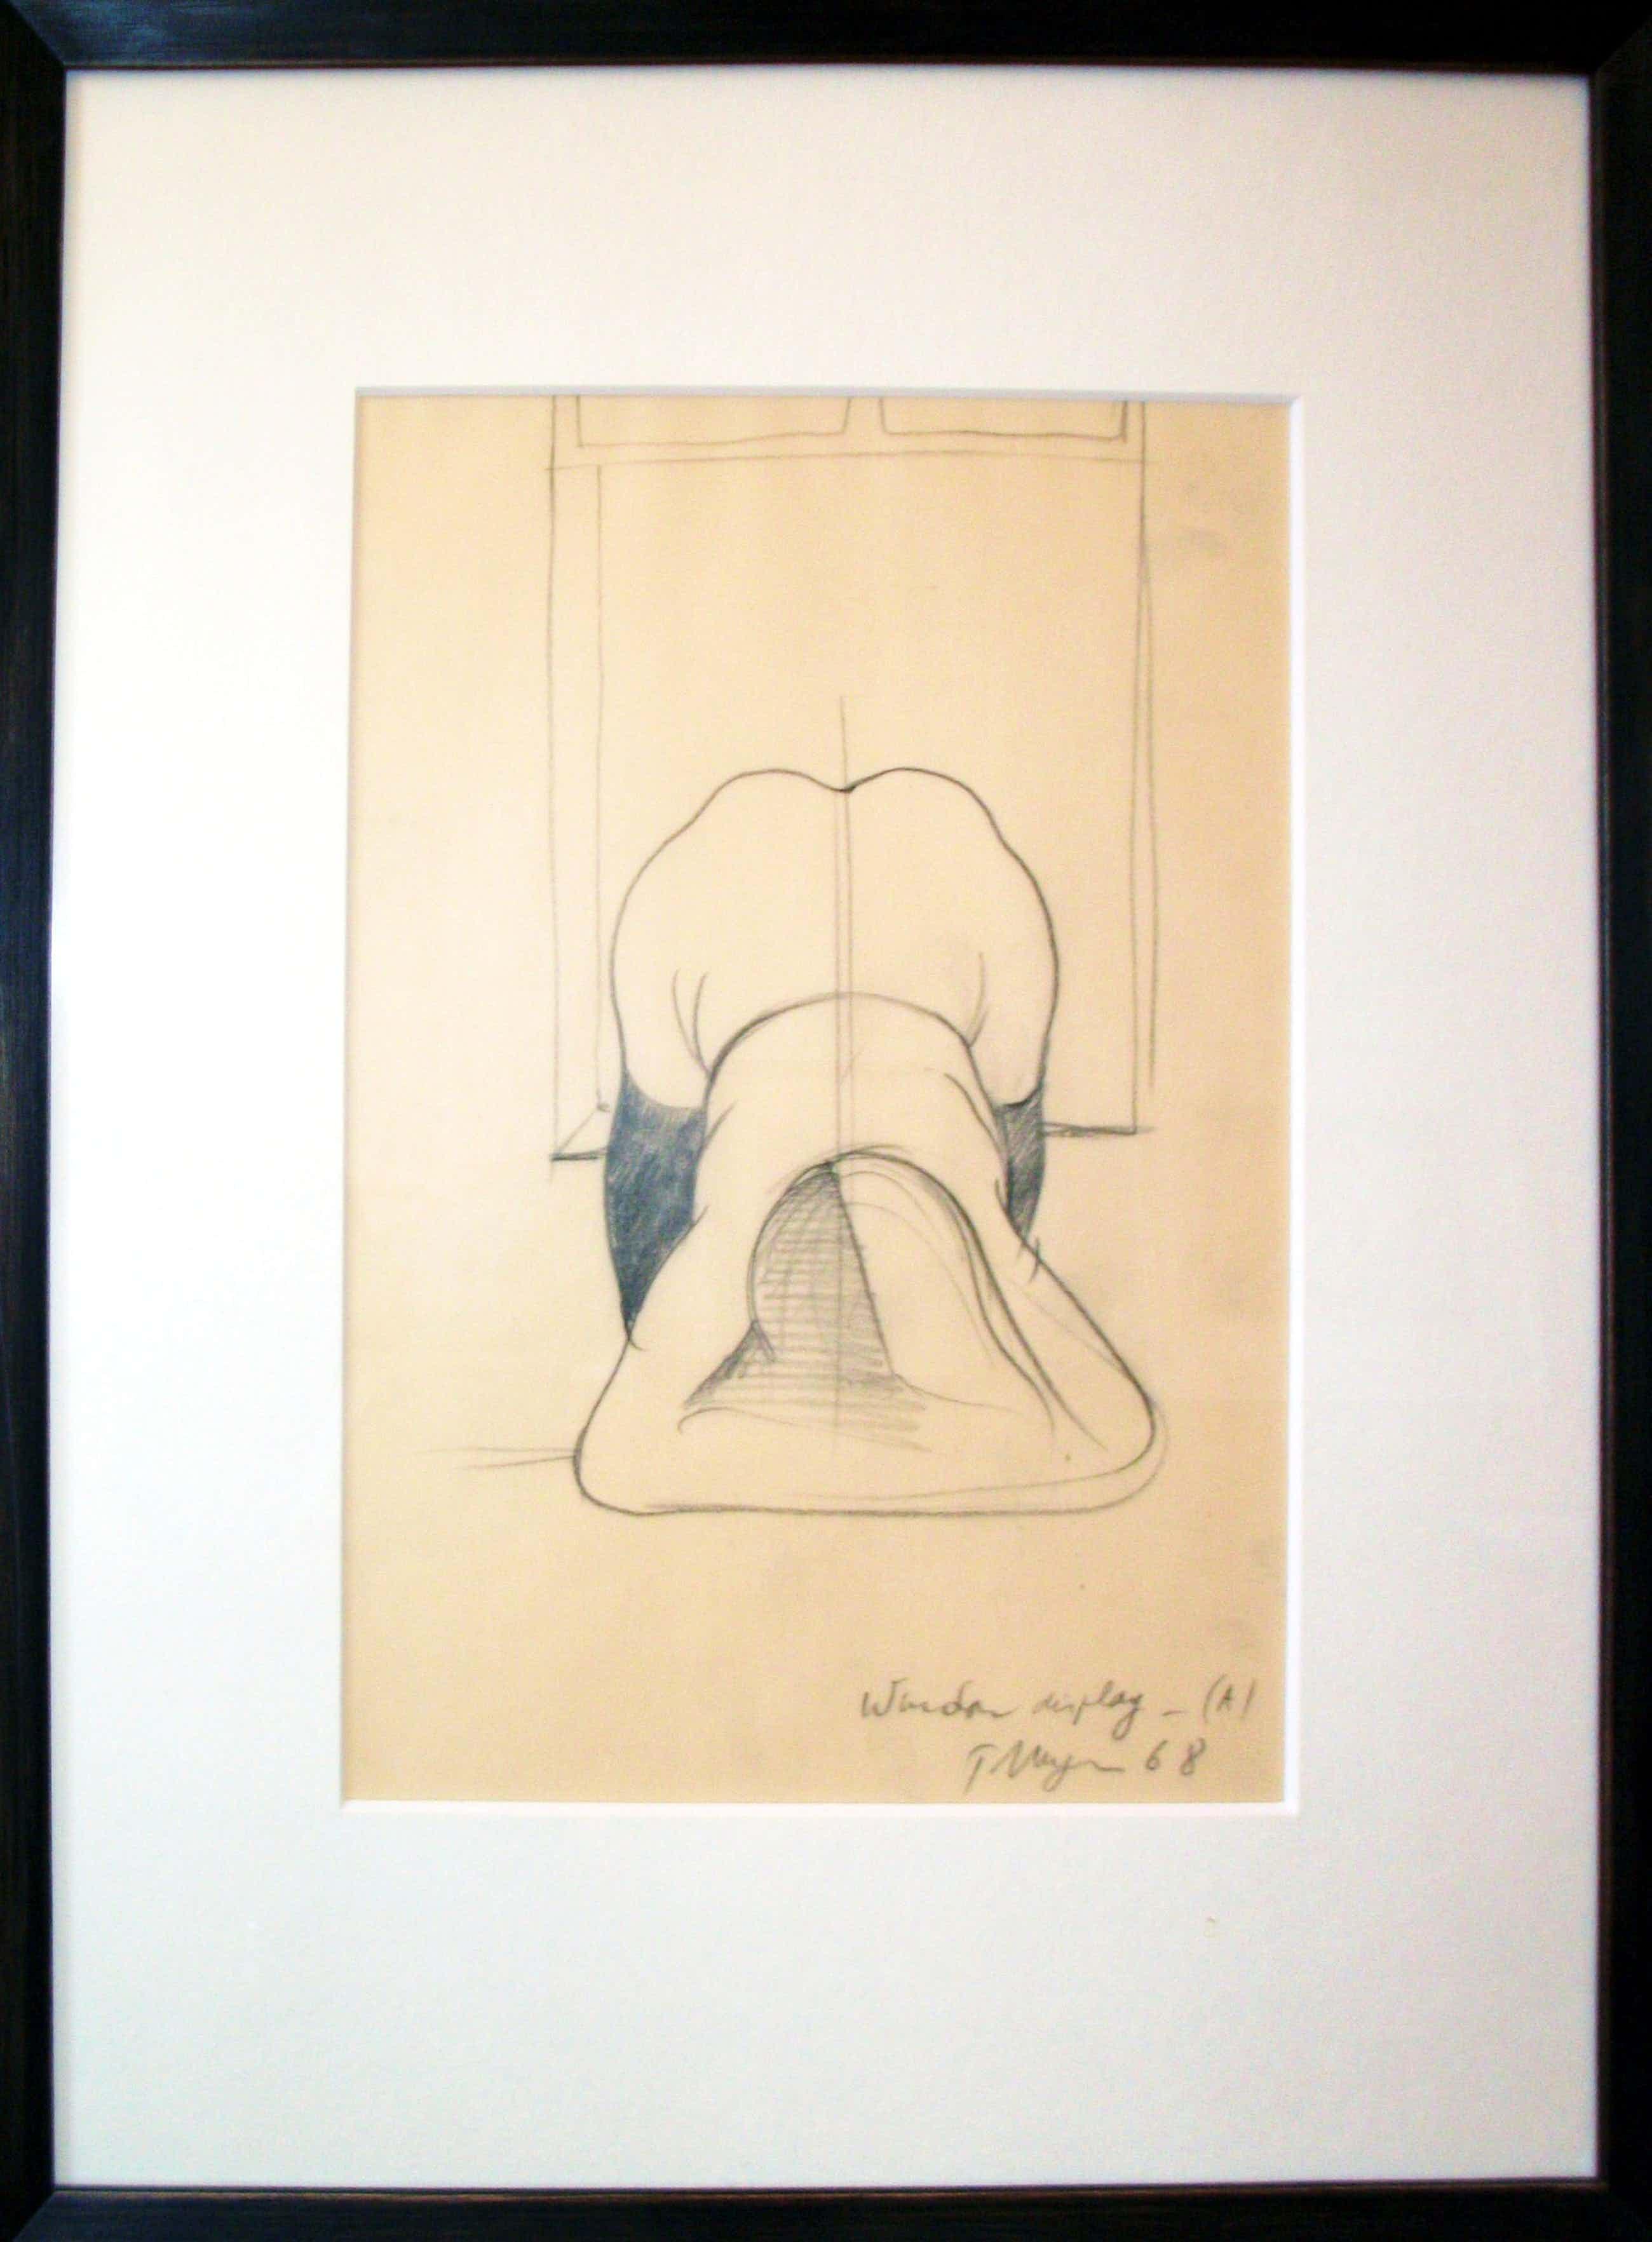 Tomi Ungerer - Window display – (A) kopen? Bied vanaf 1700!